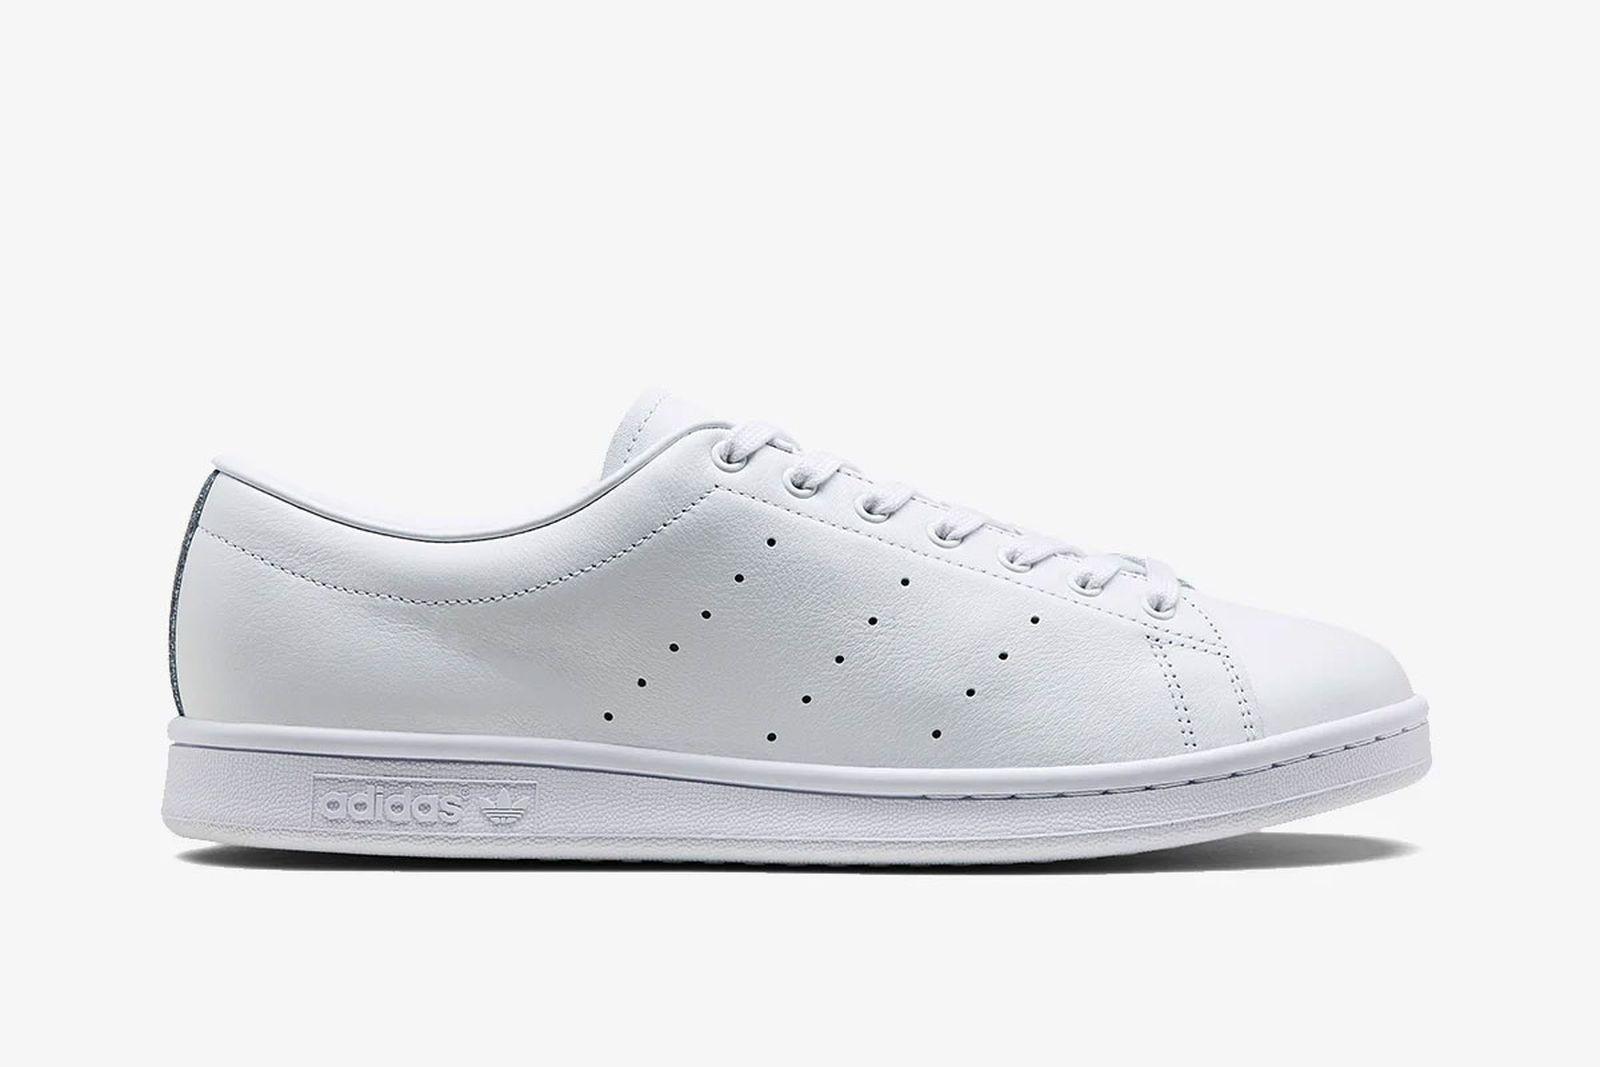 white leather hyke x adidas AOH 001